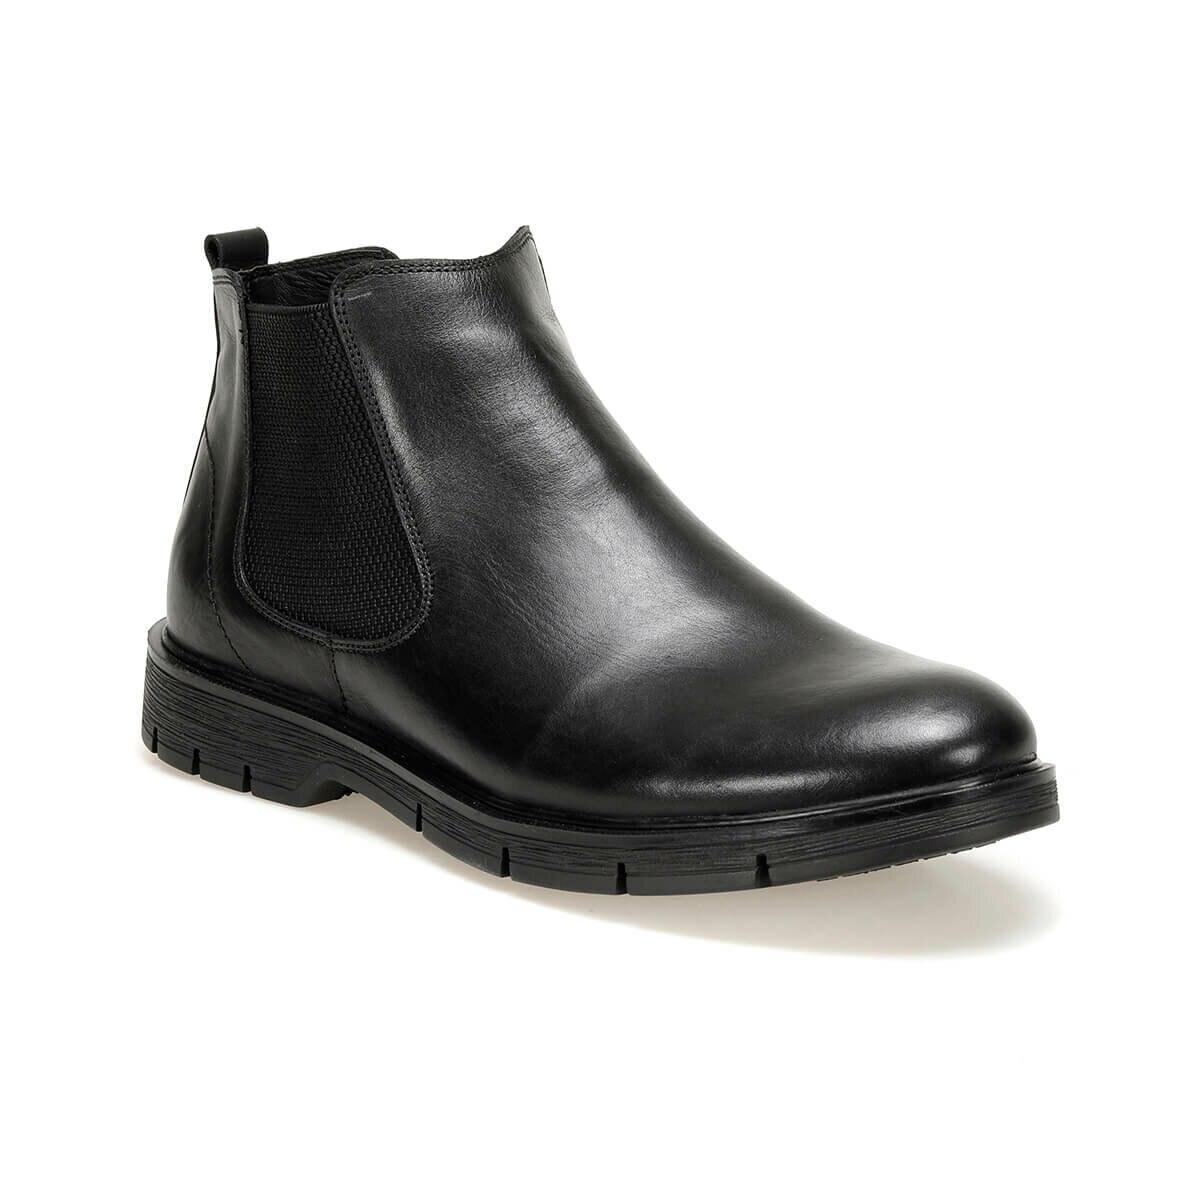 FLO 2025 czarne męskie buty Garamond